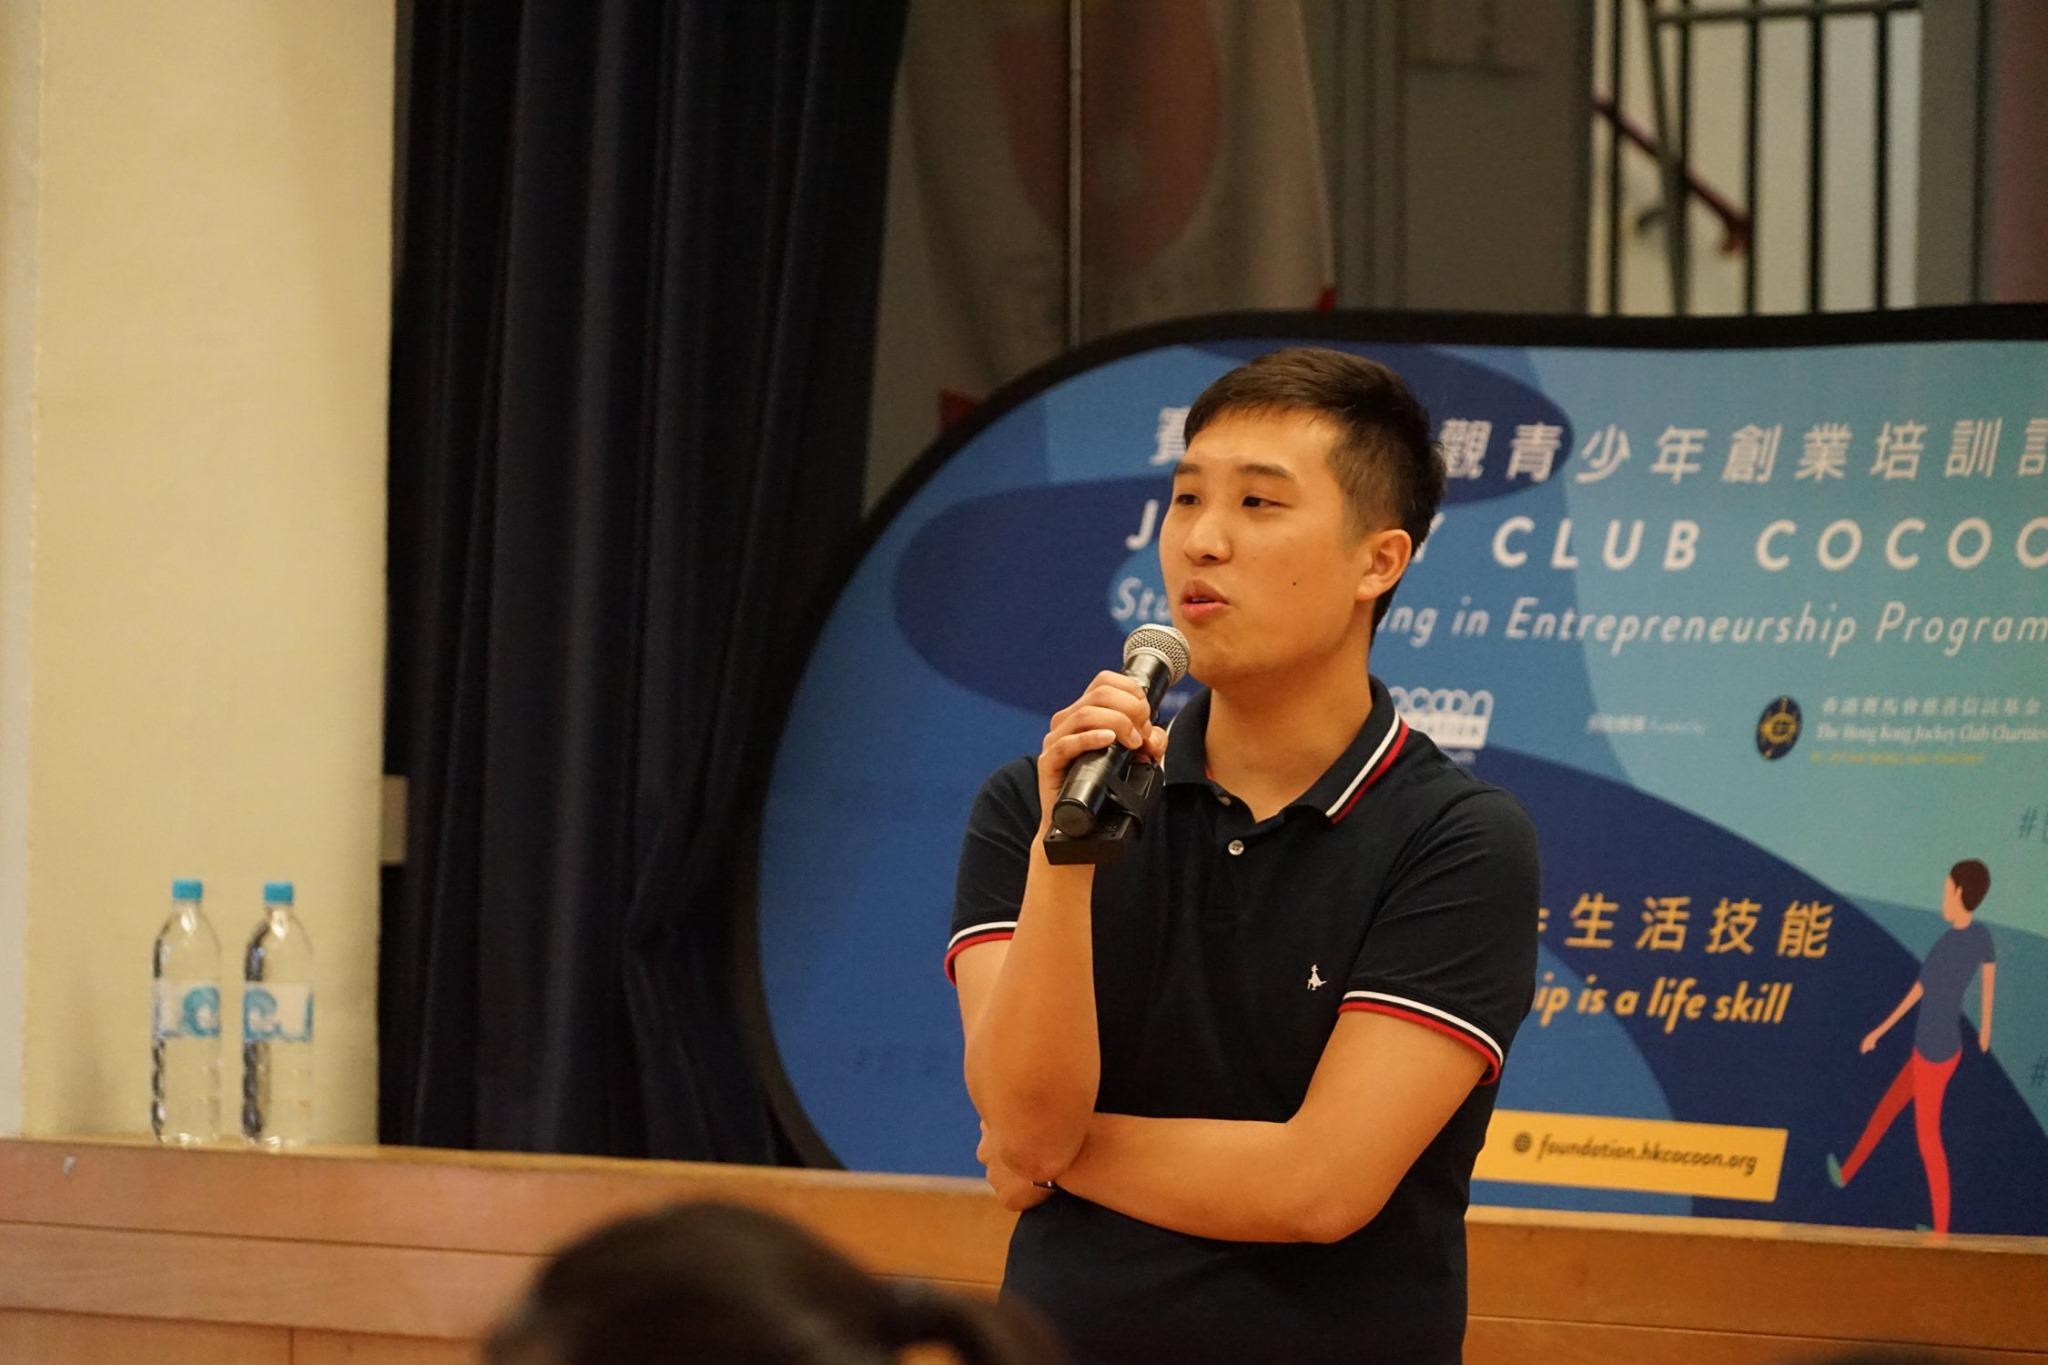 Cocoon Foundation Student Training in Entrepreneurship Step One Seminar 2